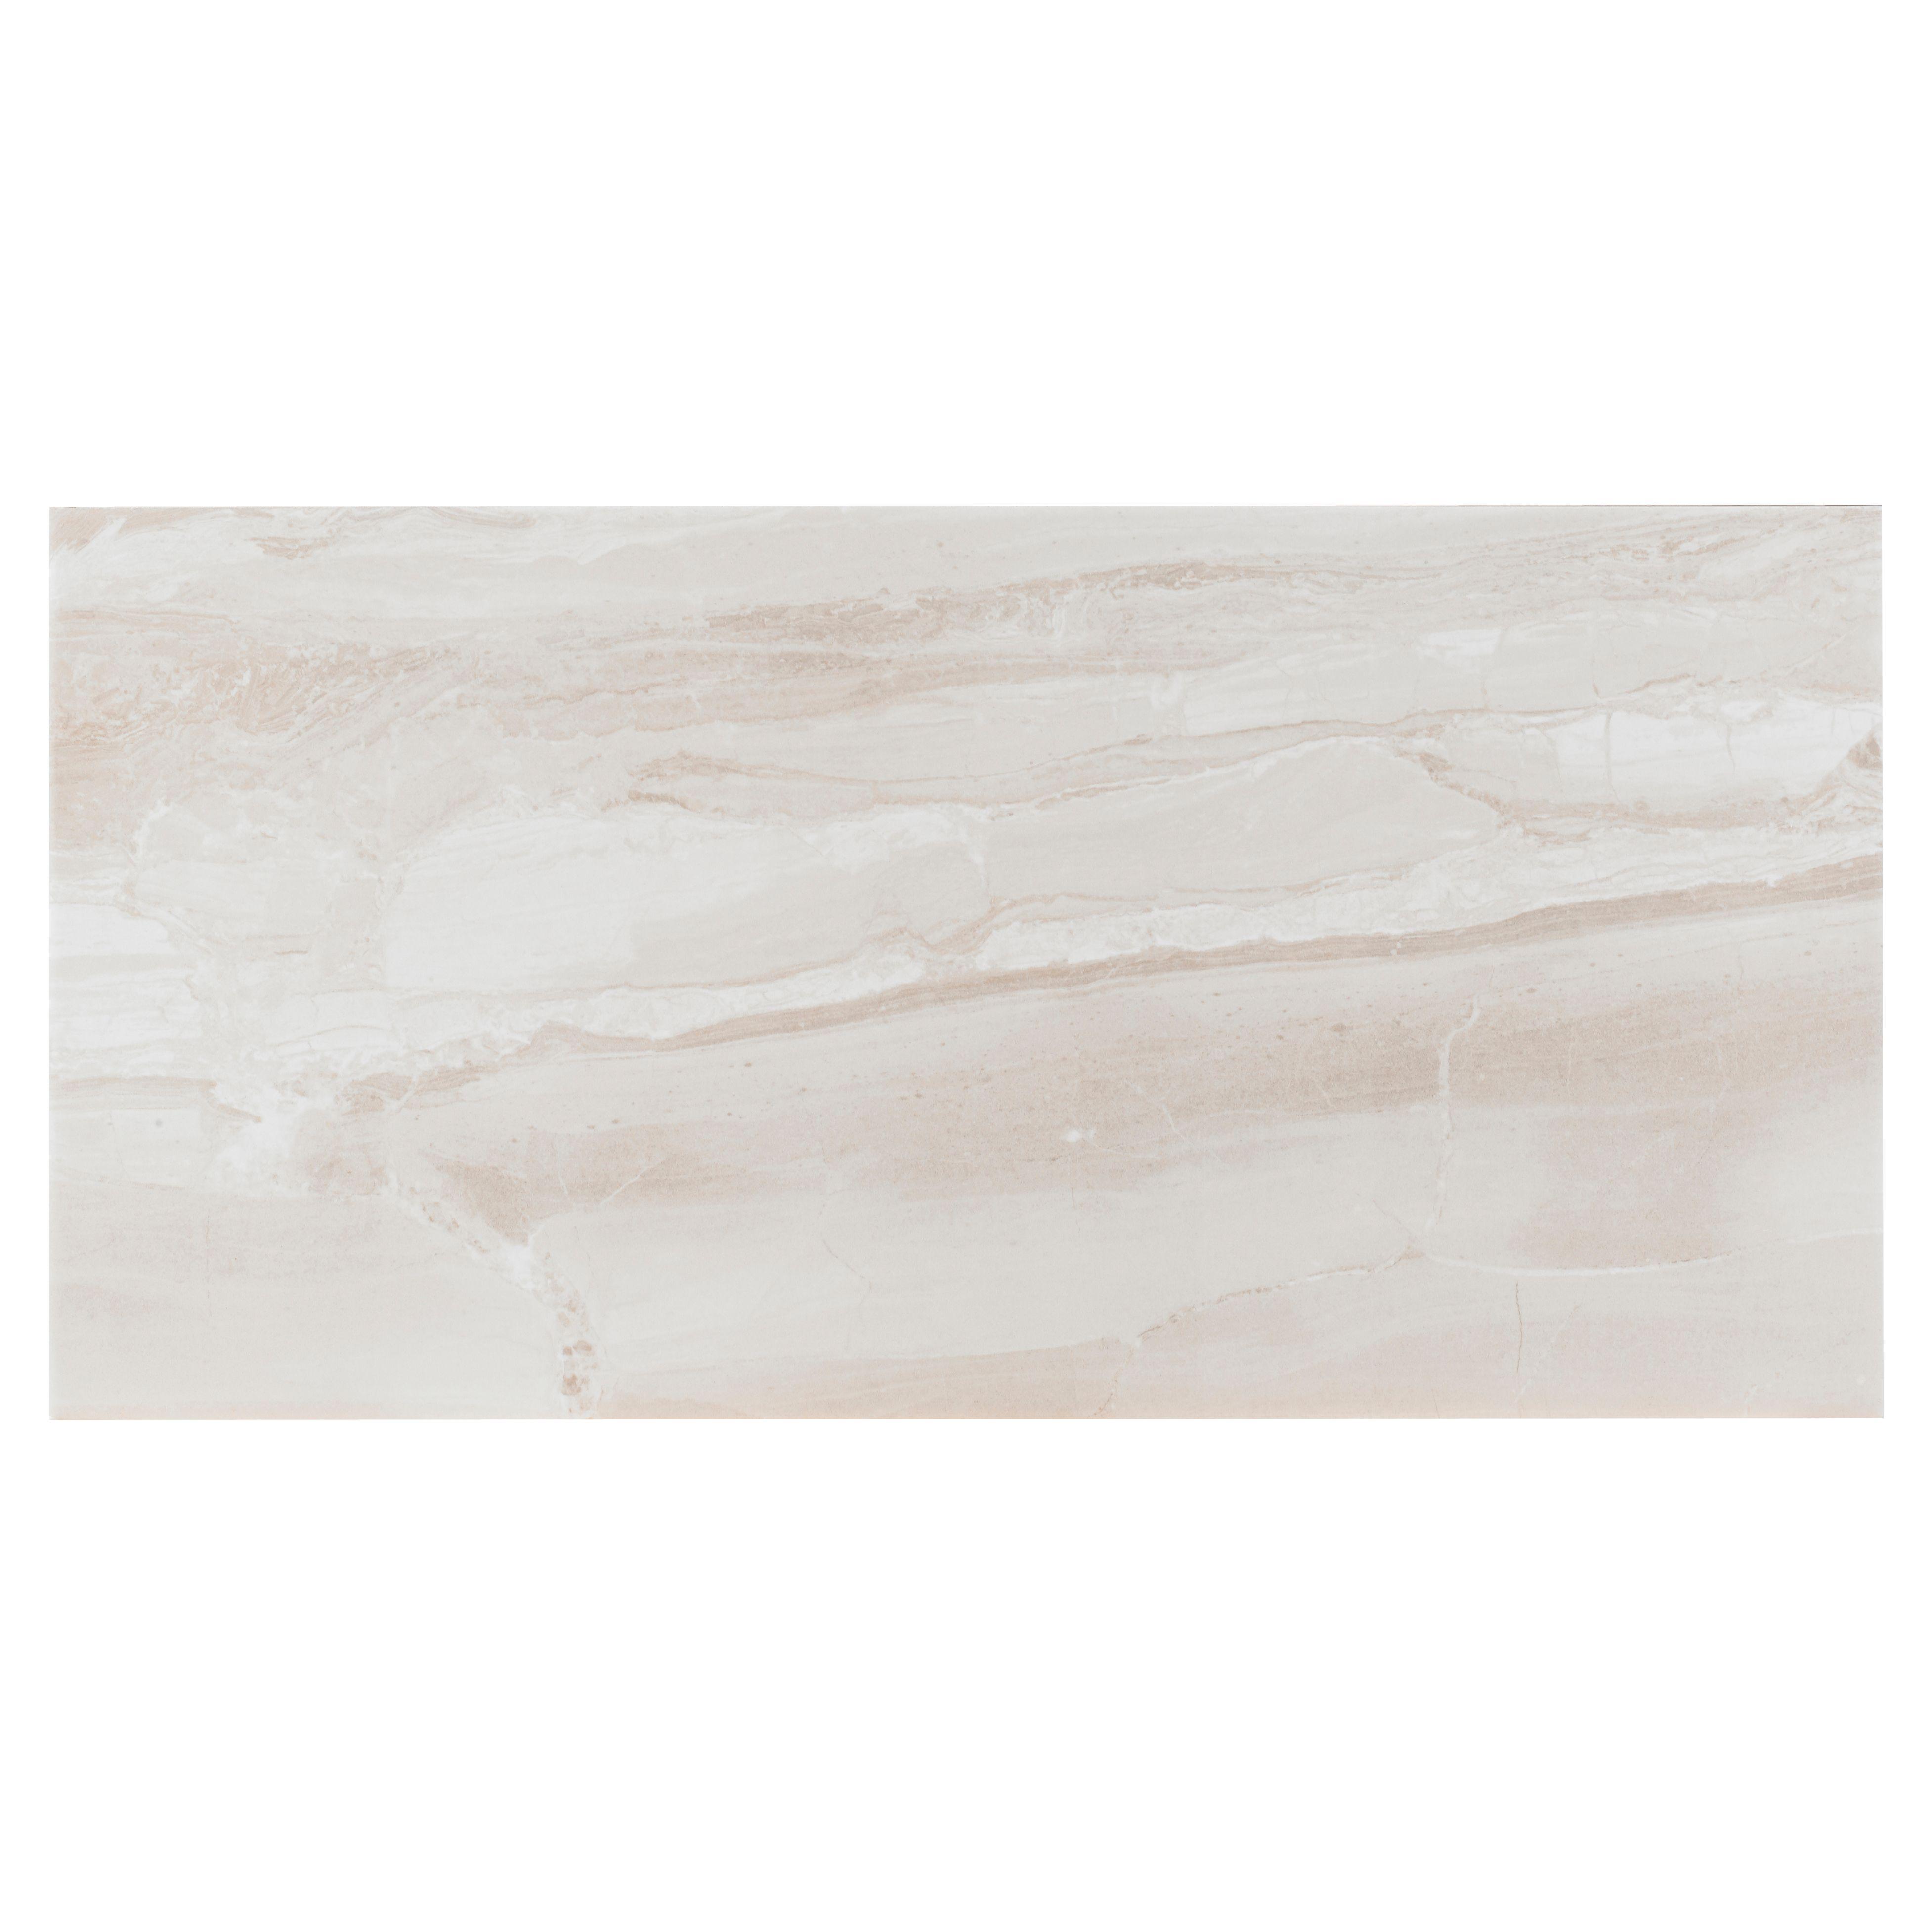 Bq Kitchen Floor Tiles Fossilised Wood Sand Stone Effect Ceramic Sample Wall Floor Tile